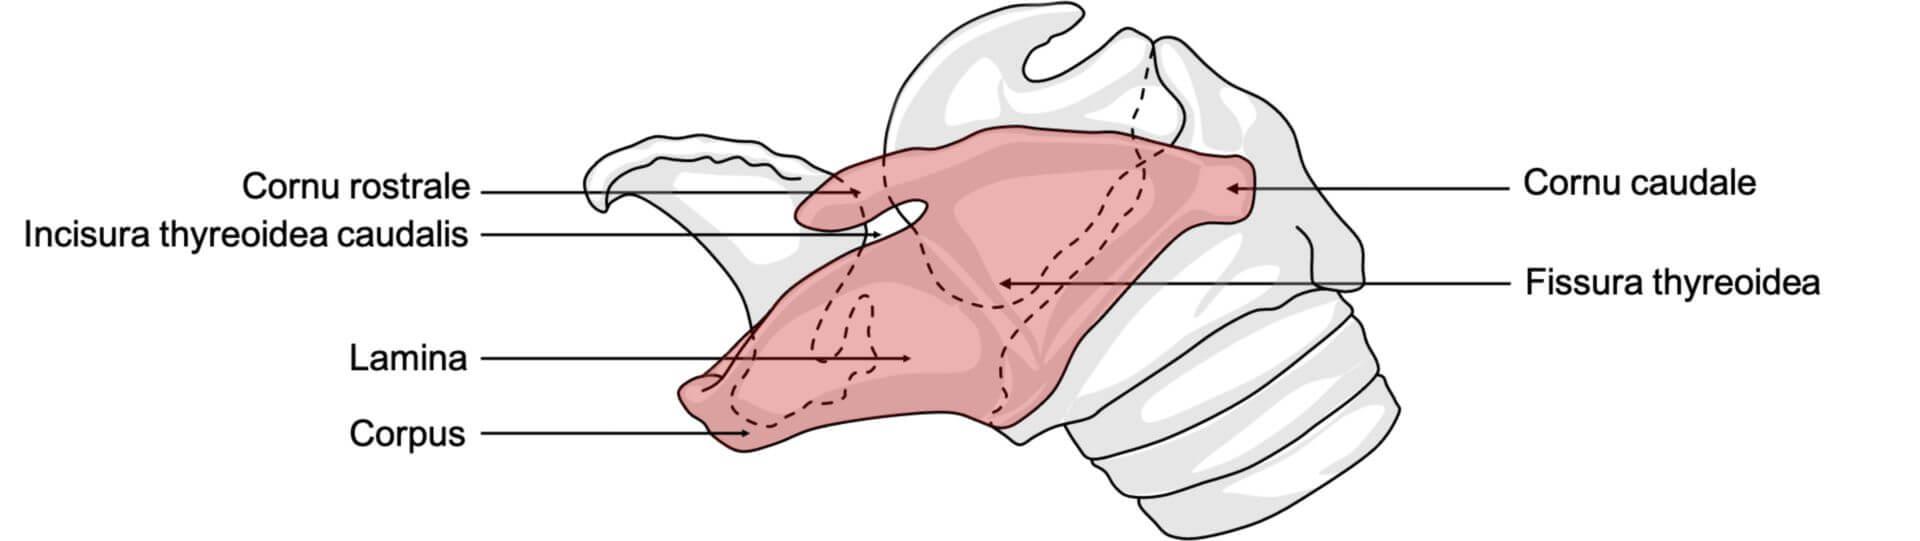 Cartilago thyreoidea beim Pferd (© Patrick Messner)